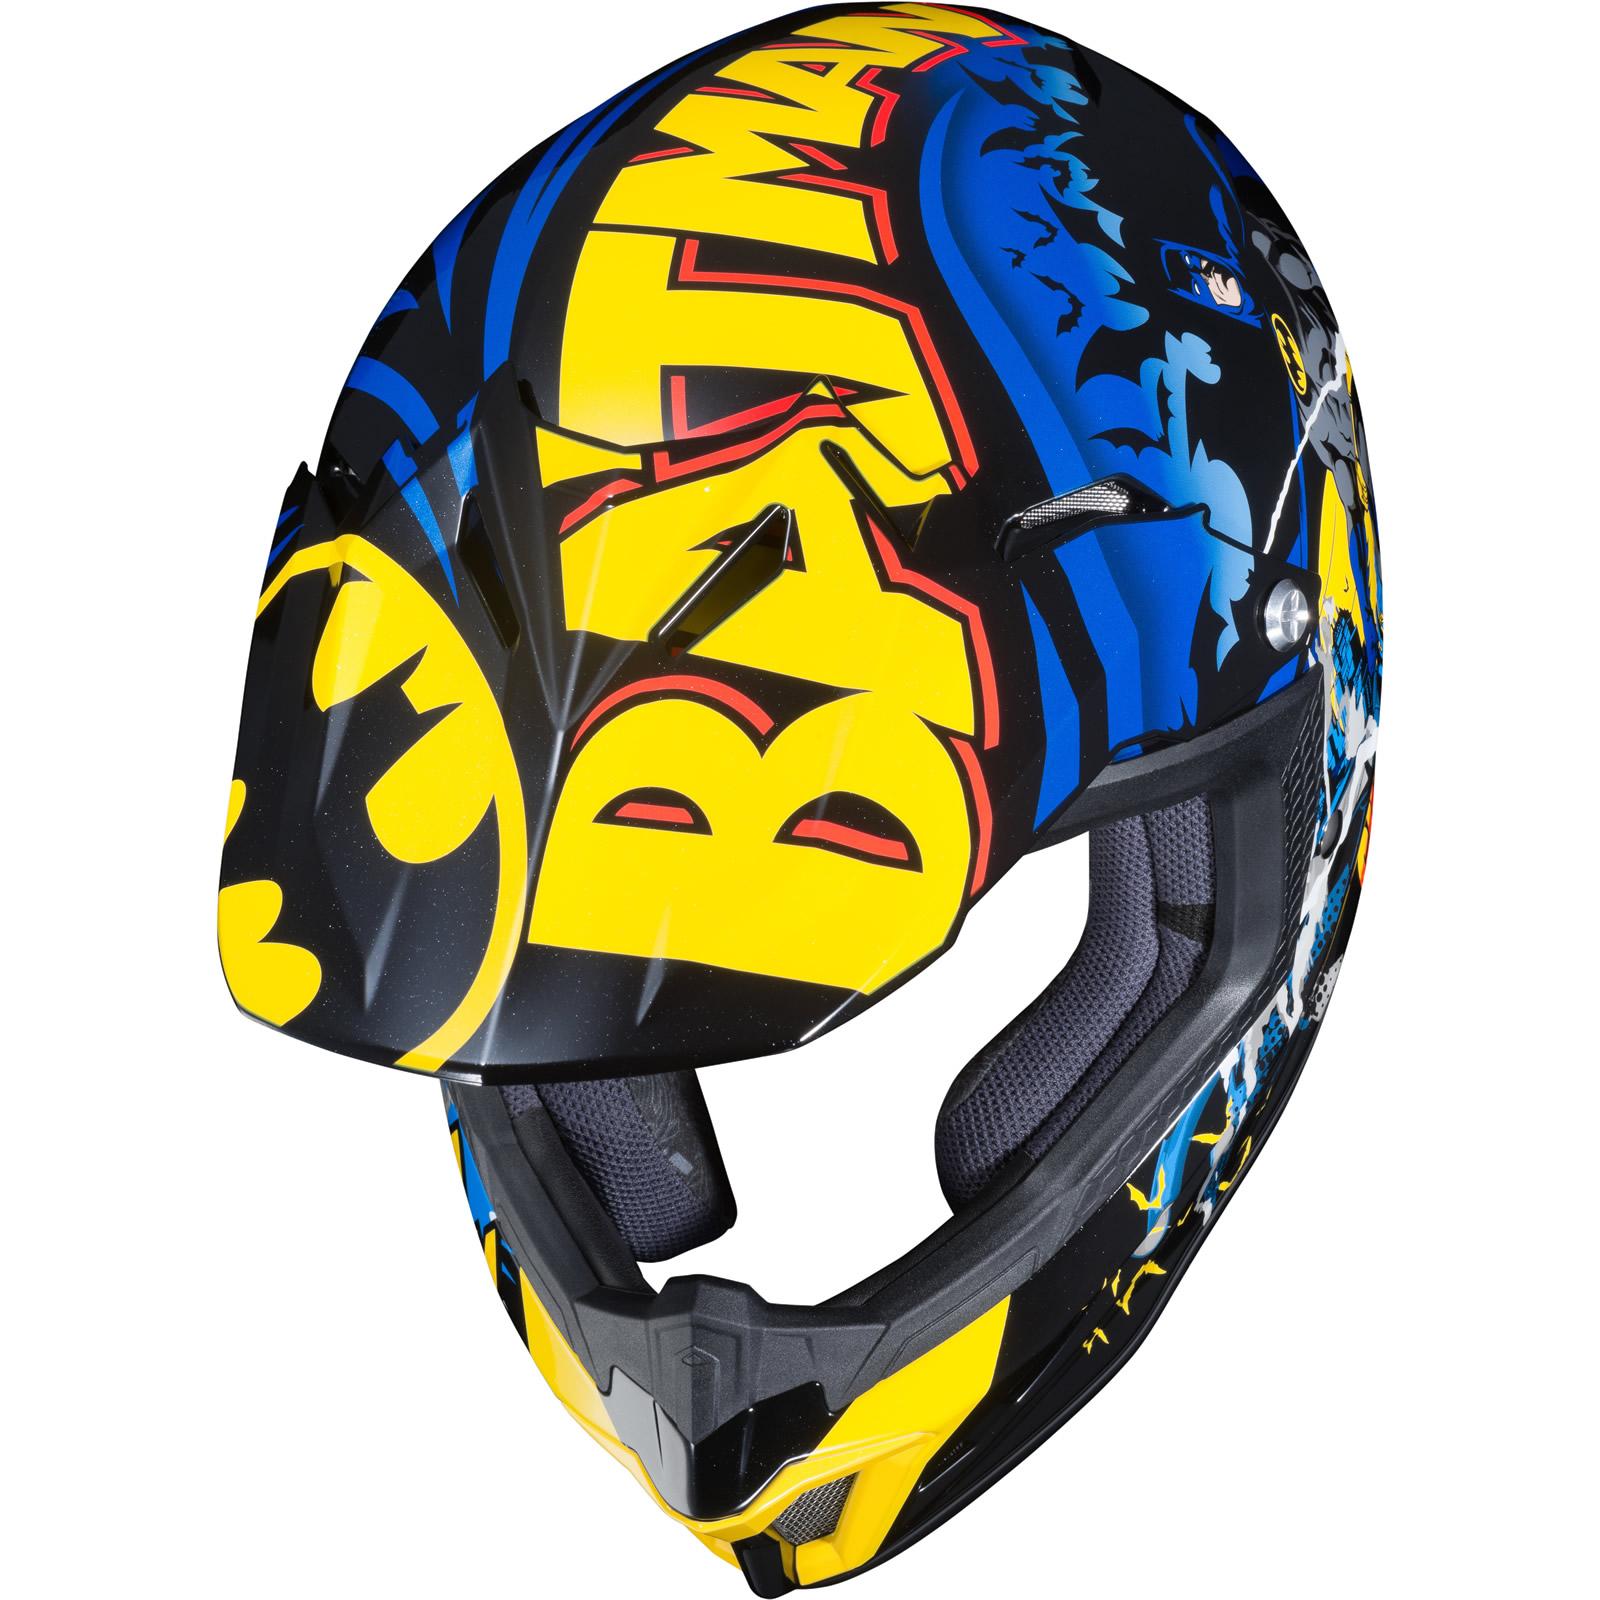 thumbnail 7 - HJC CL-XY II Batman Youth Motocross Helmet Kids MX Off-Road ATV DirtBike Helm